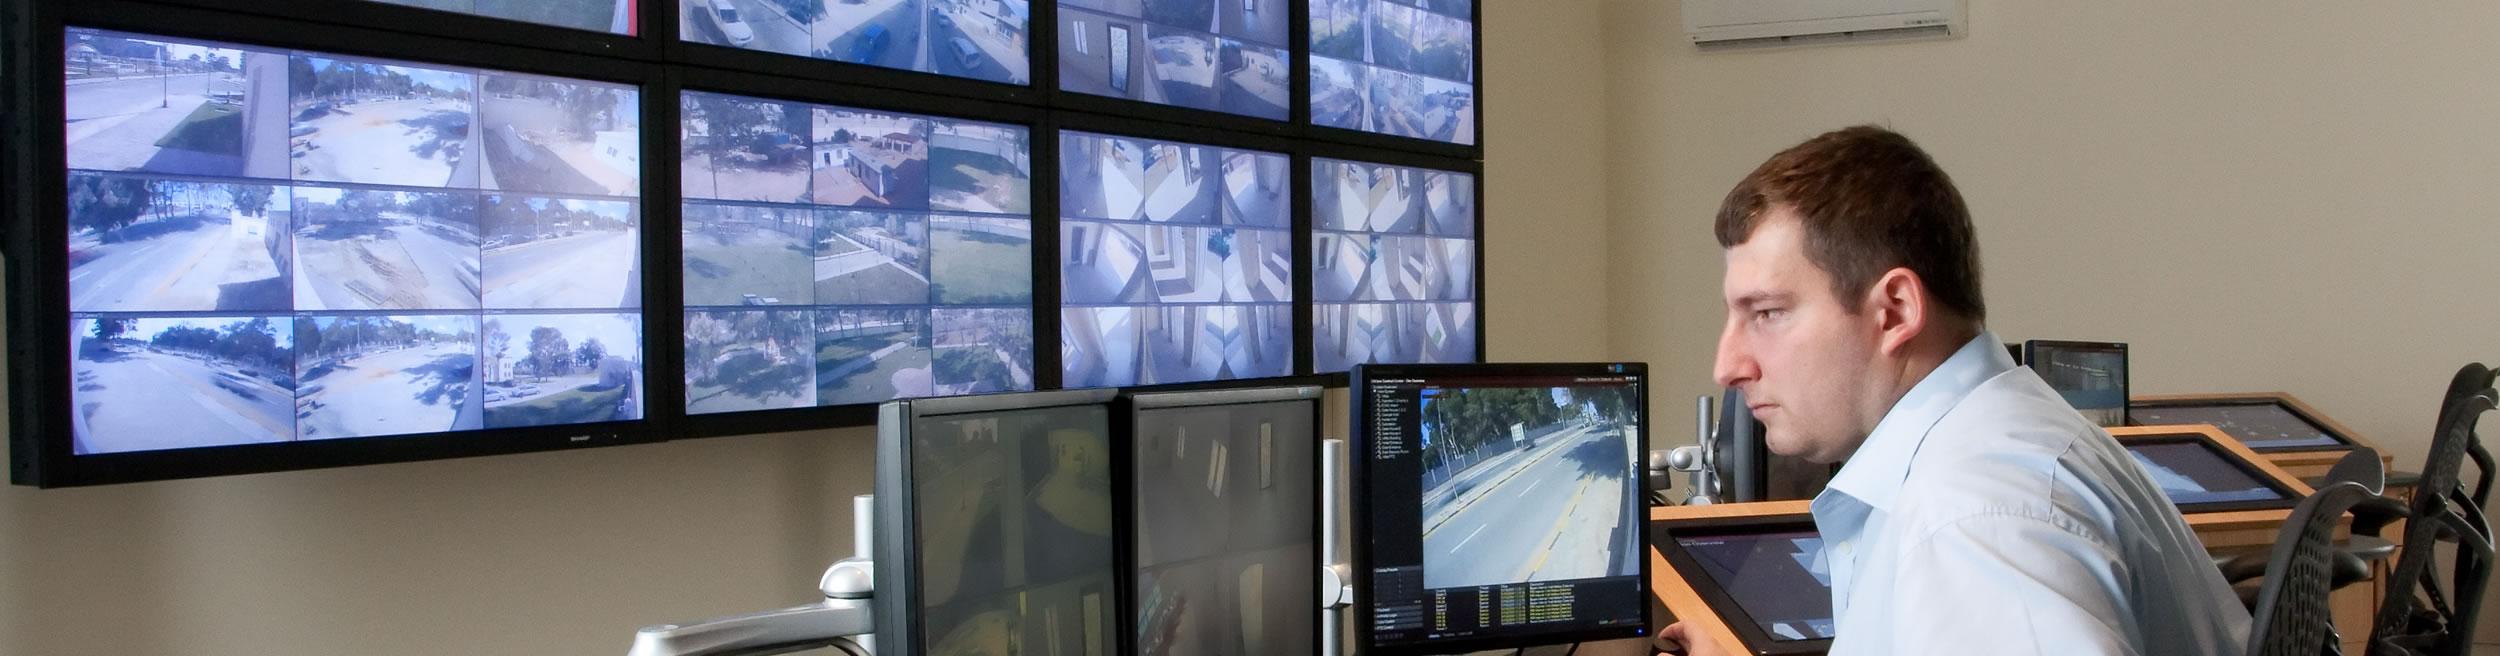 Defline - Systemy CCTV